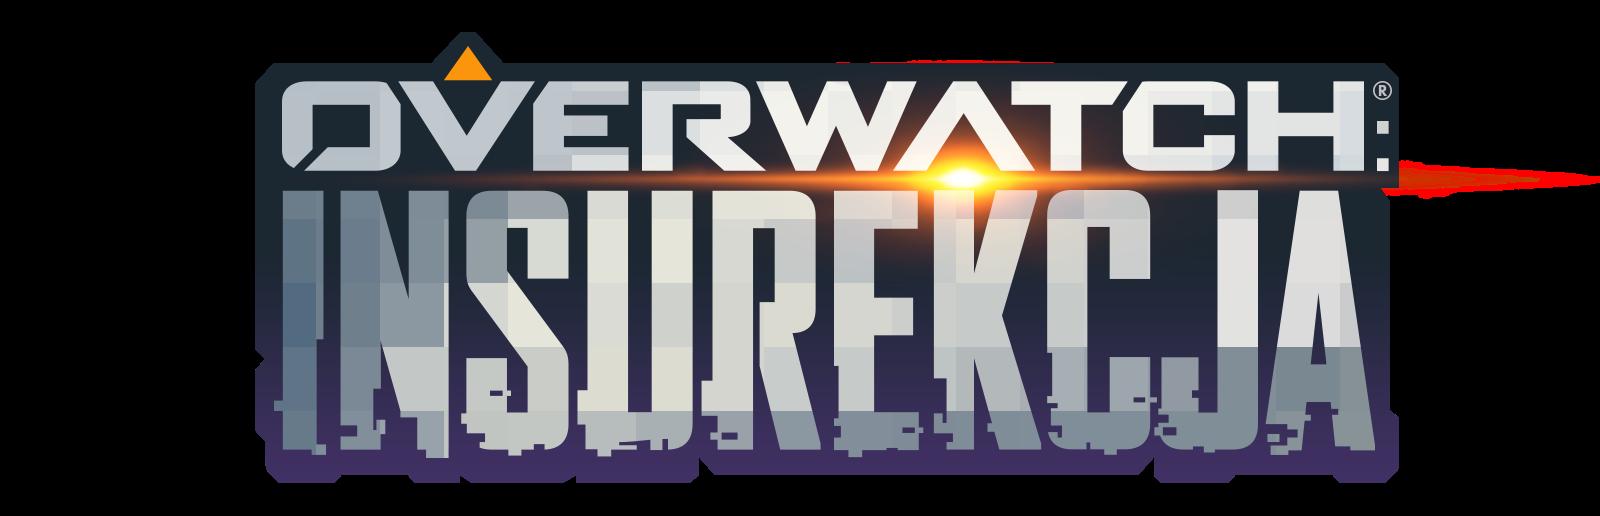 Overwatch: Insurekcja